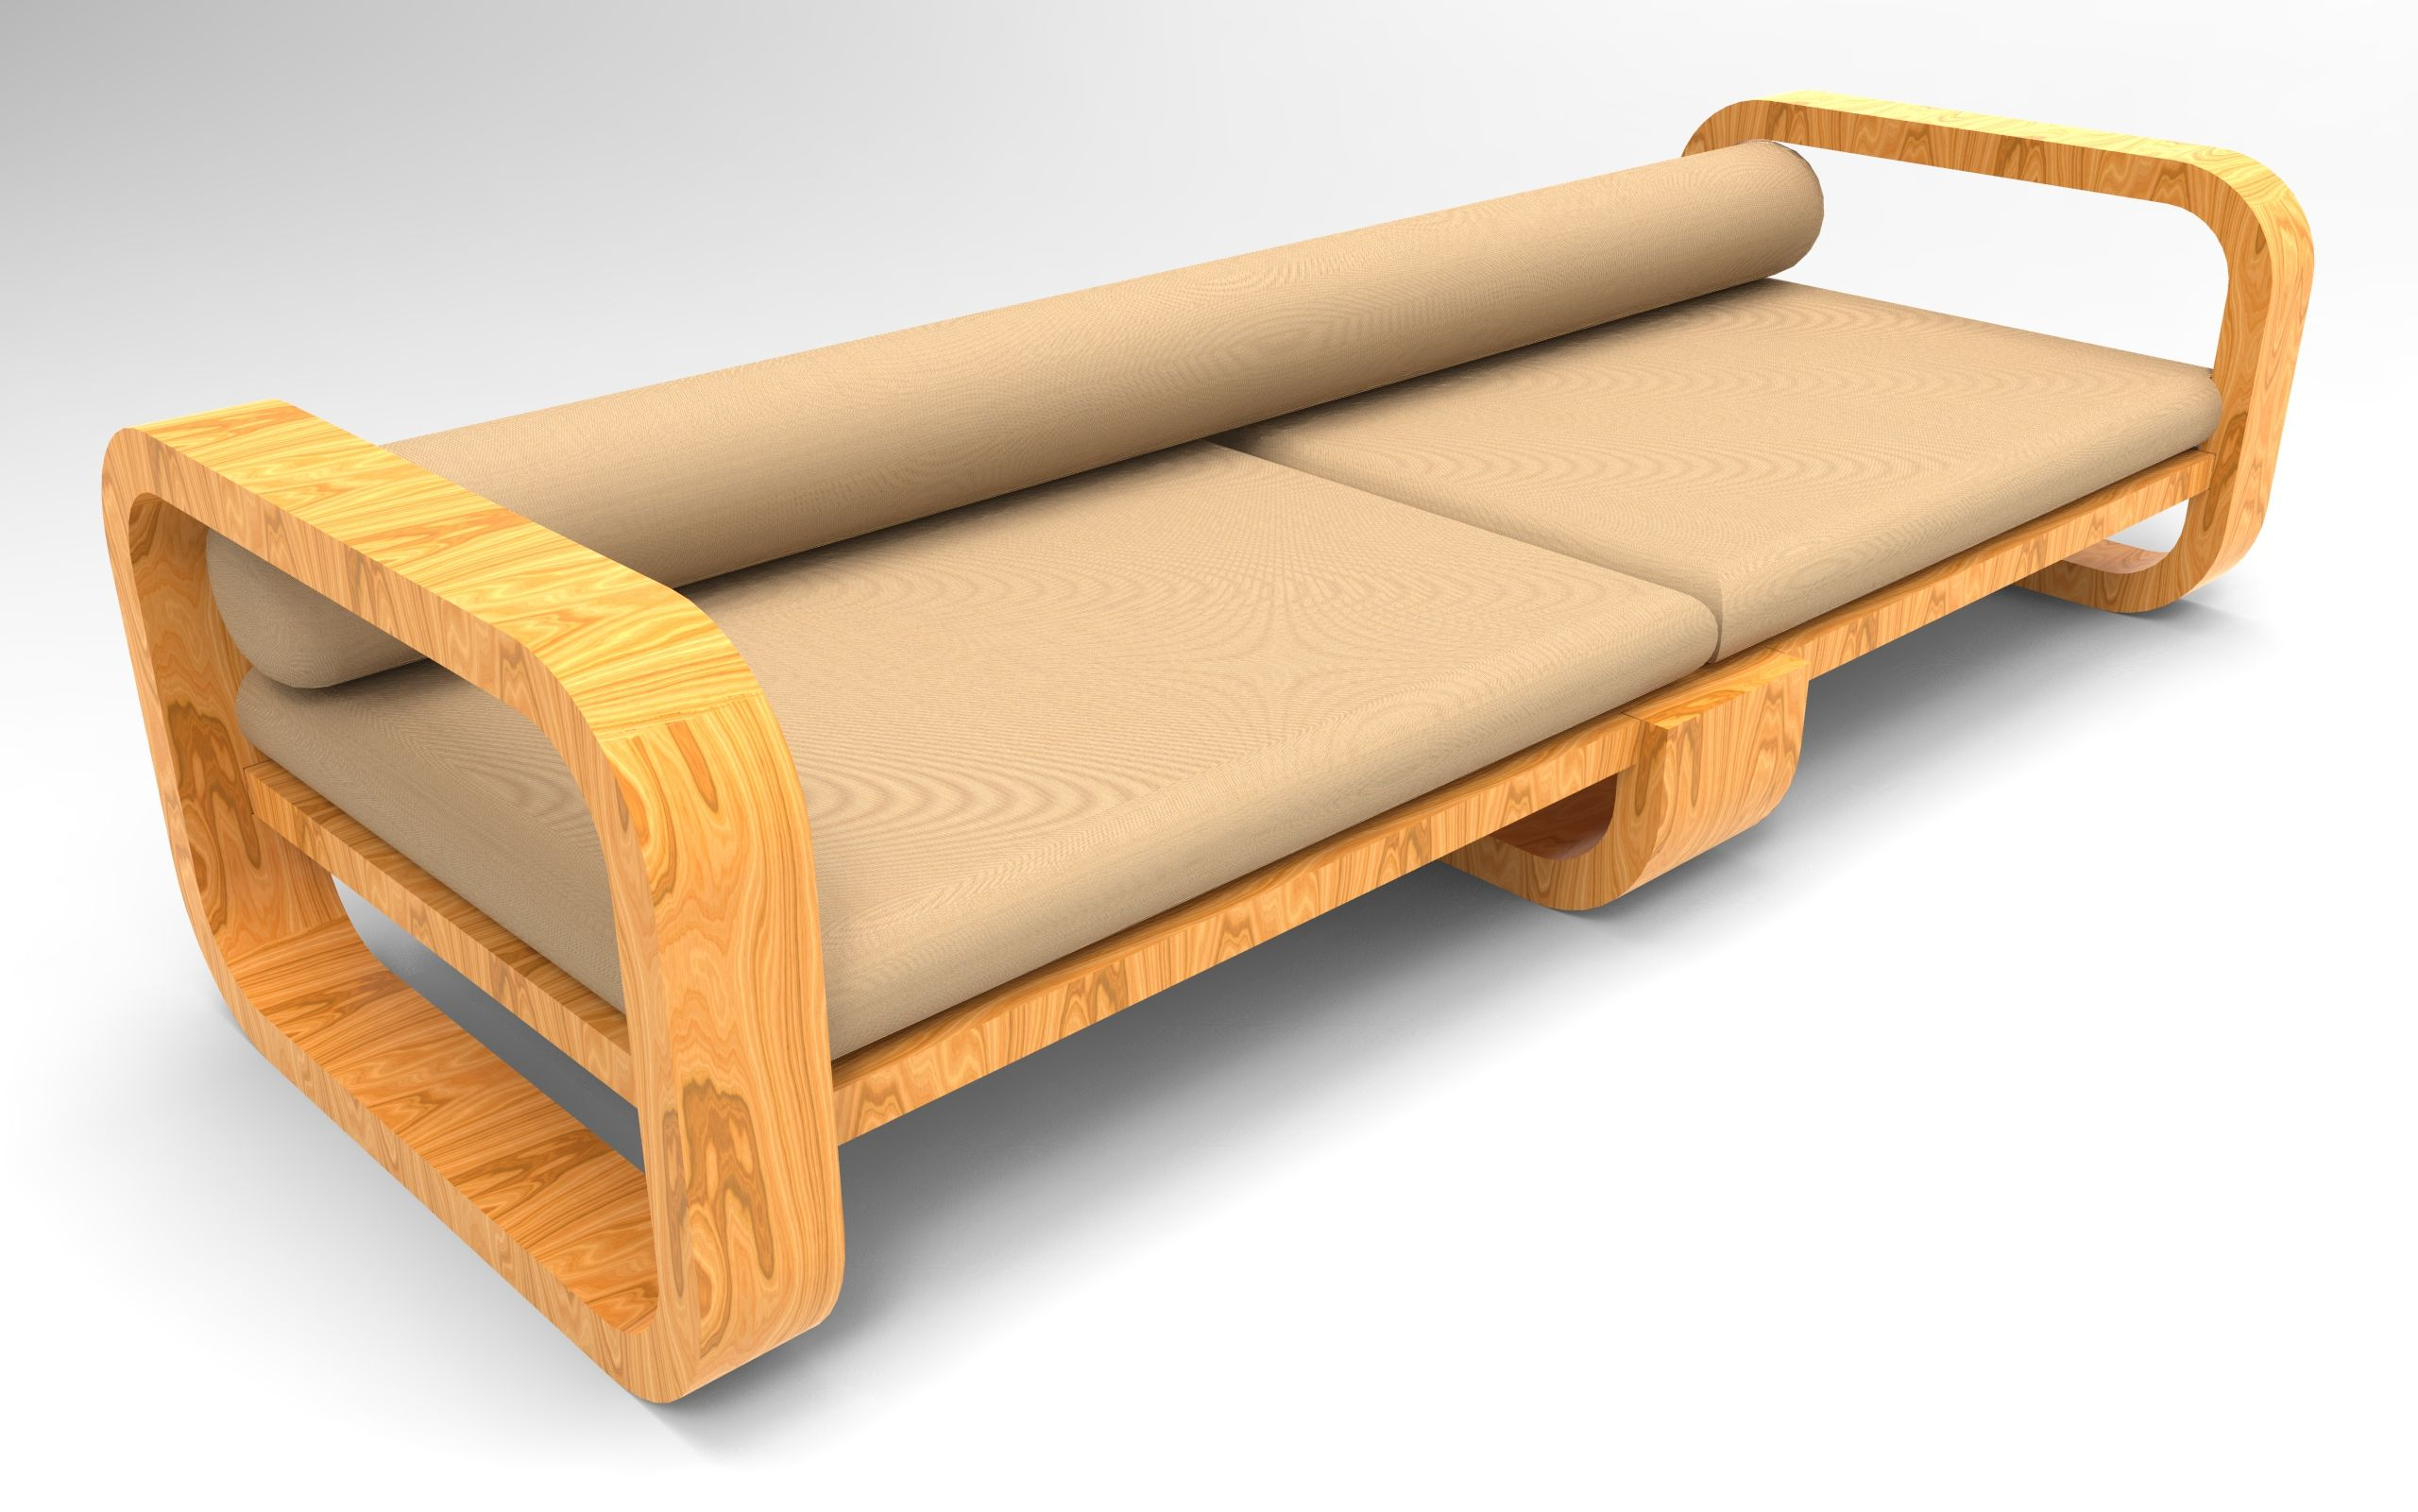 Design-couch-sofa-lucas-lira-fabnerdes-3500-3500